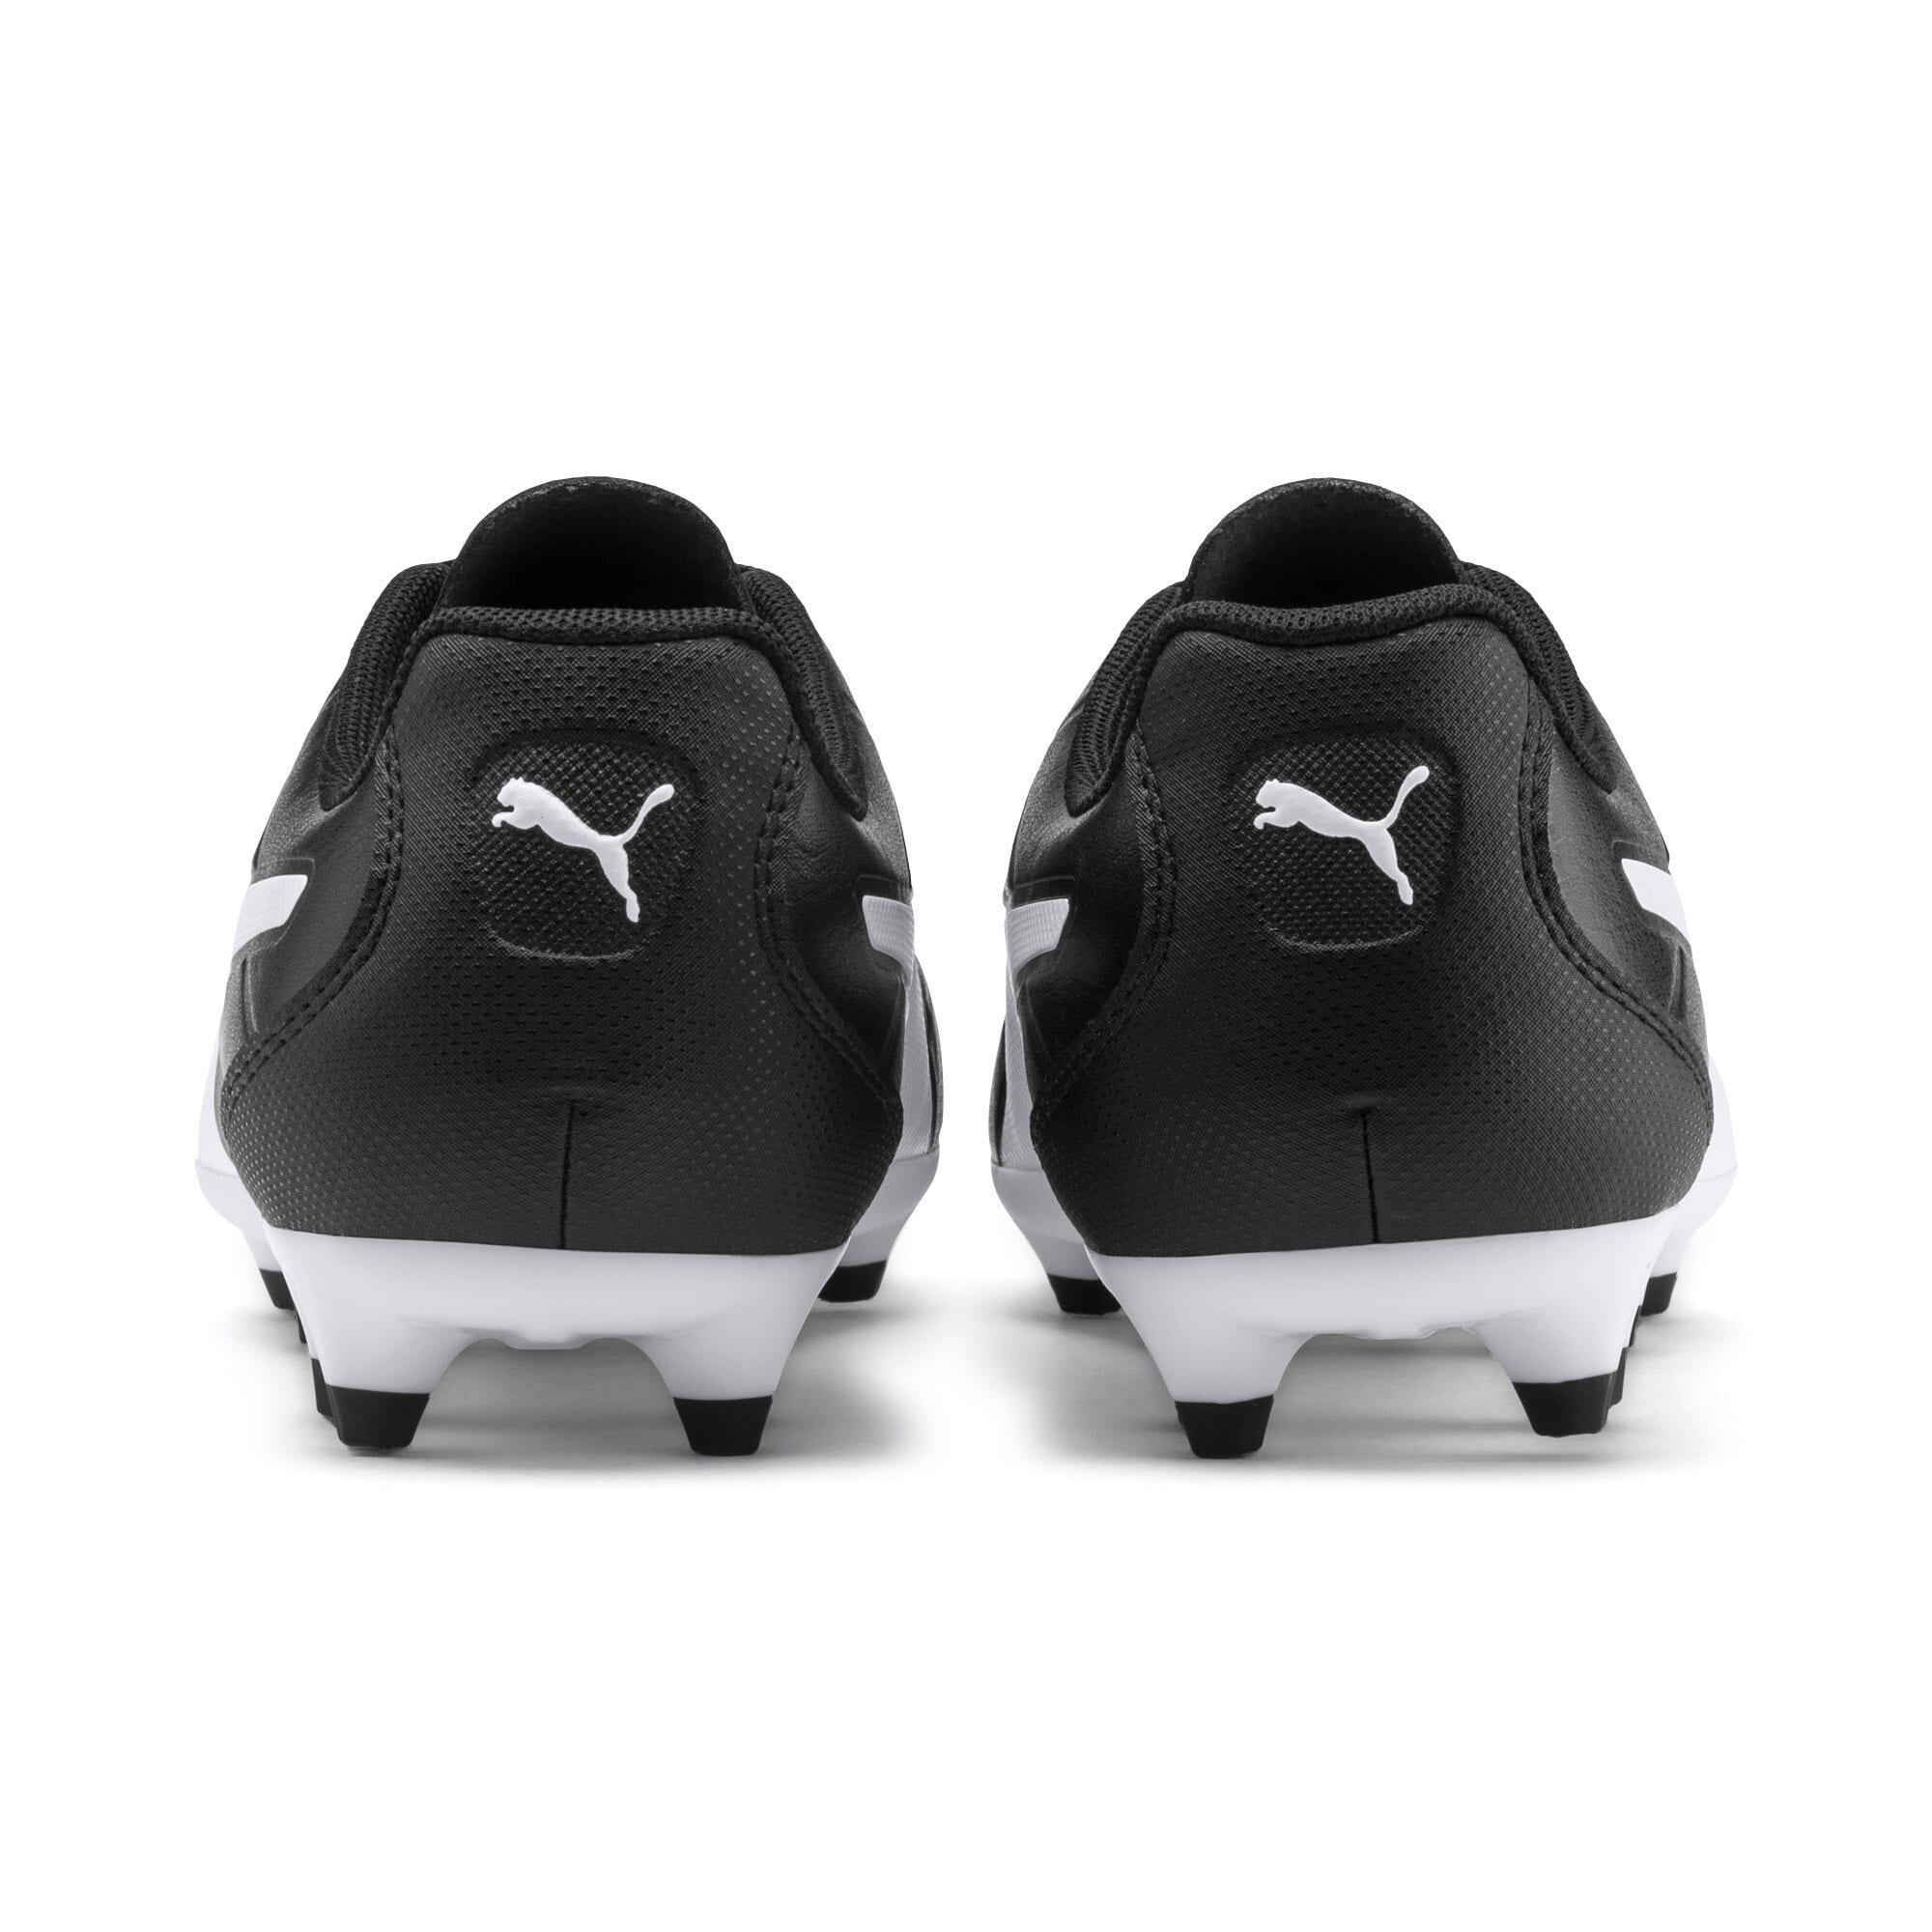 Thumbnail 3 of Monarch FG Youth Football Boots, Puma Black-Puma White, medium